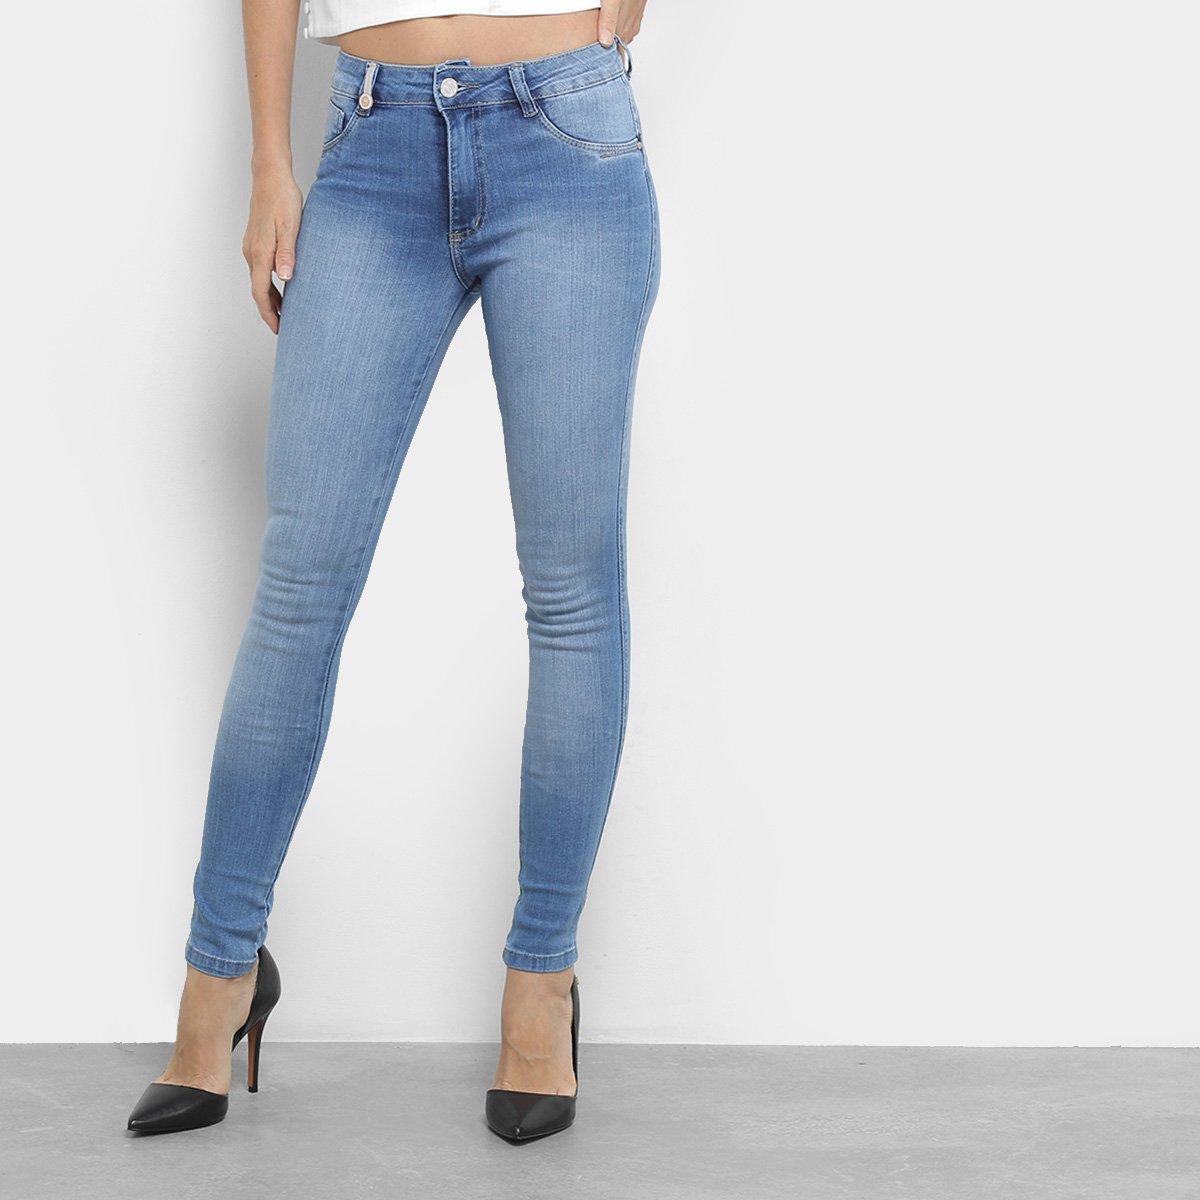 1ca606b01 Calças Jeans Skinny Biotipo Cintura Média Feminina